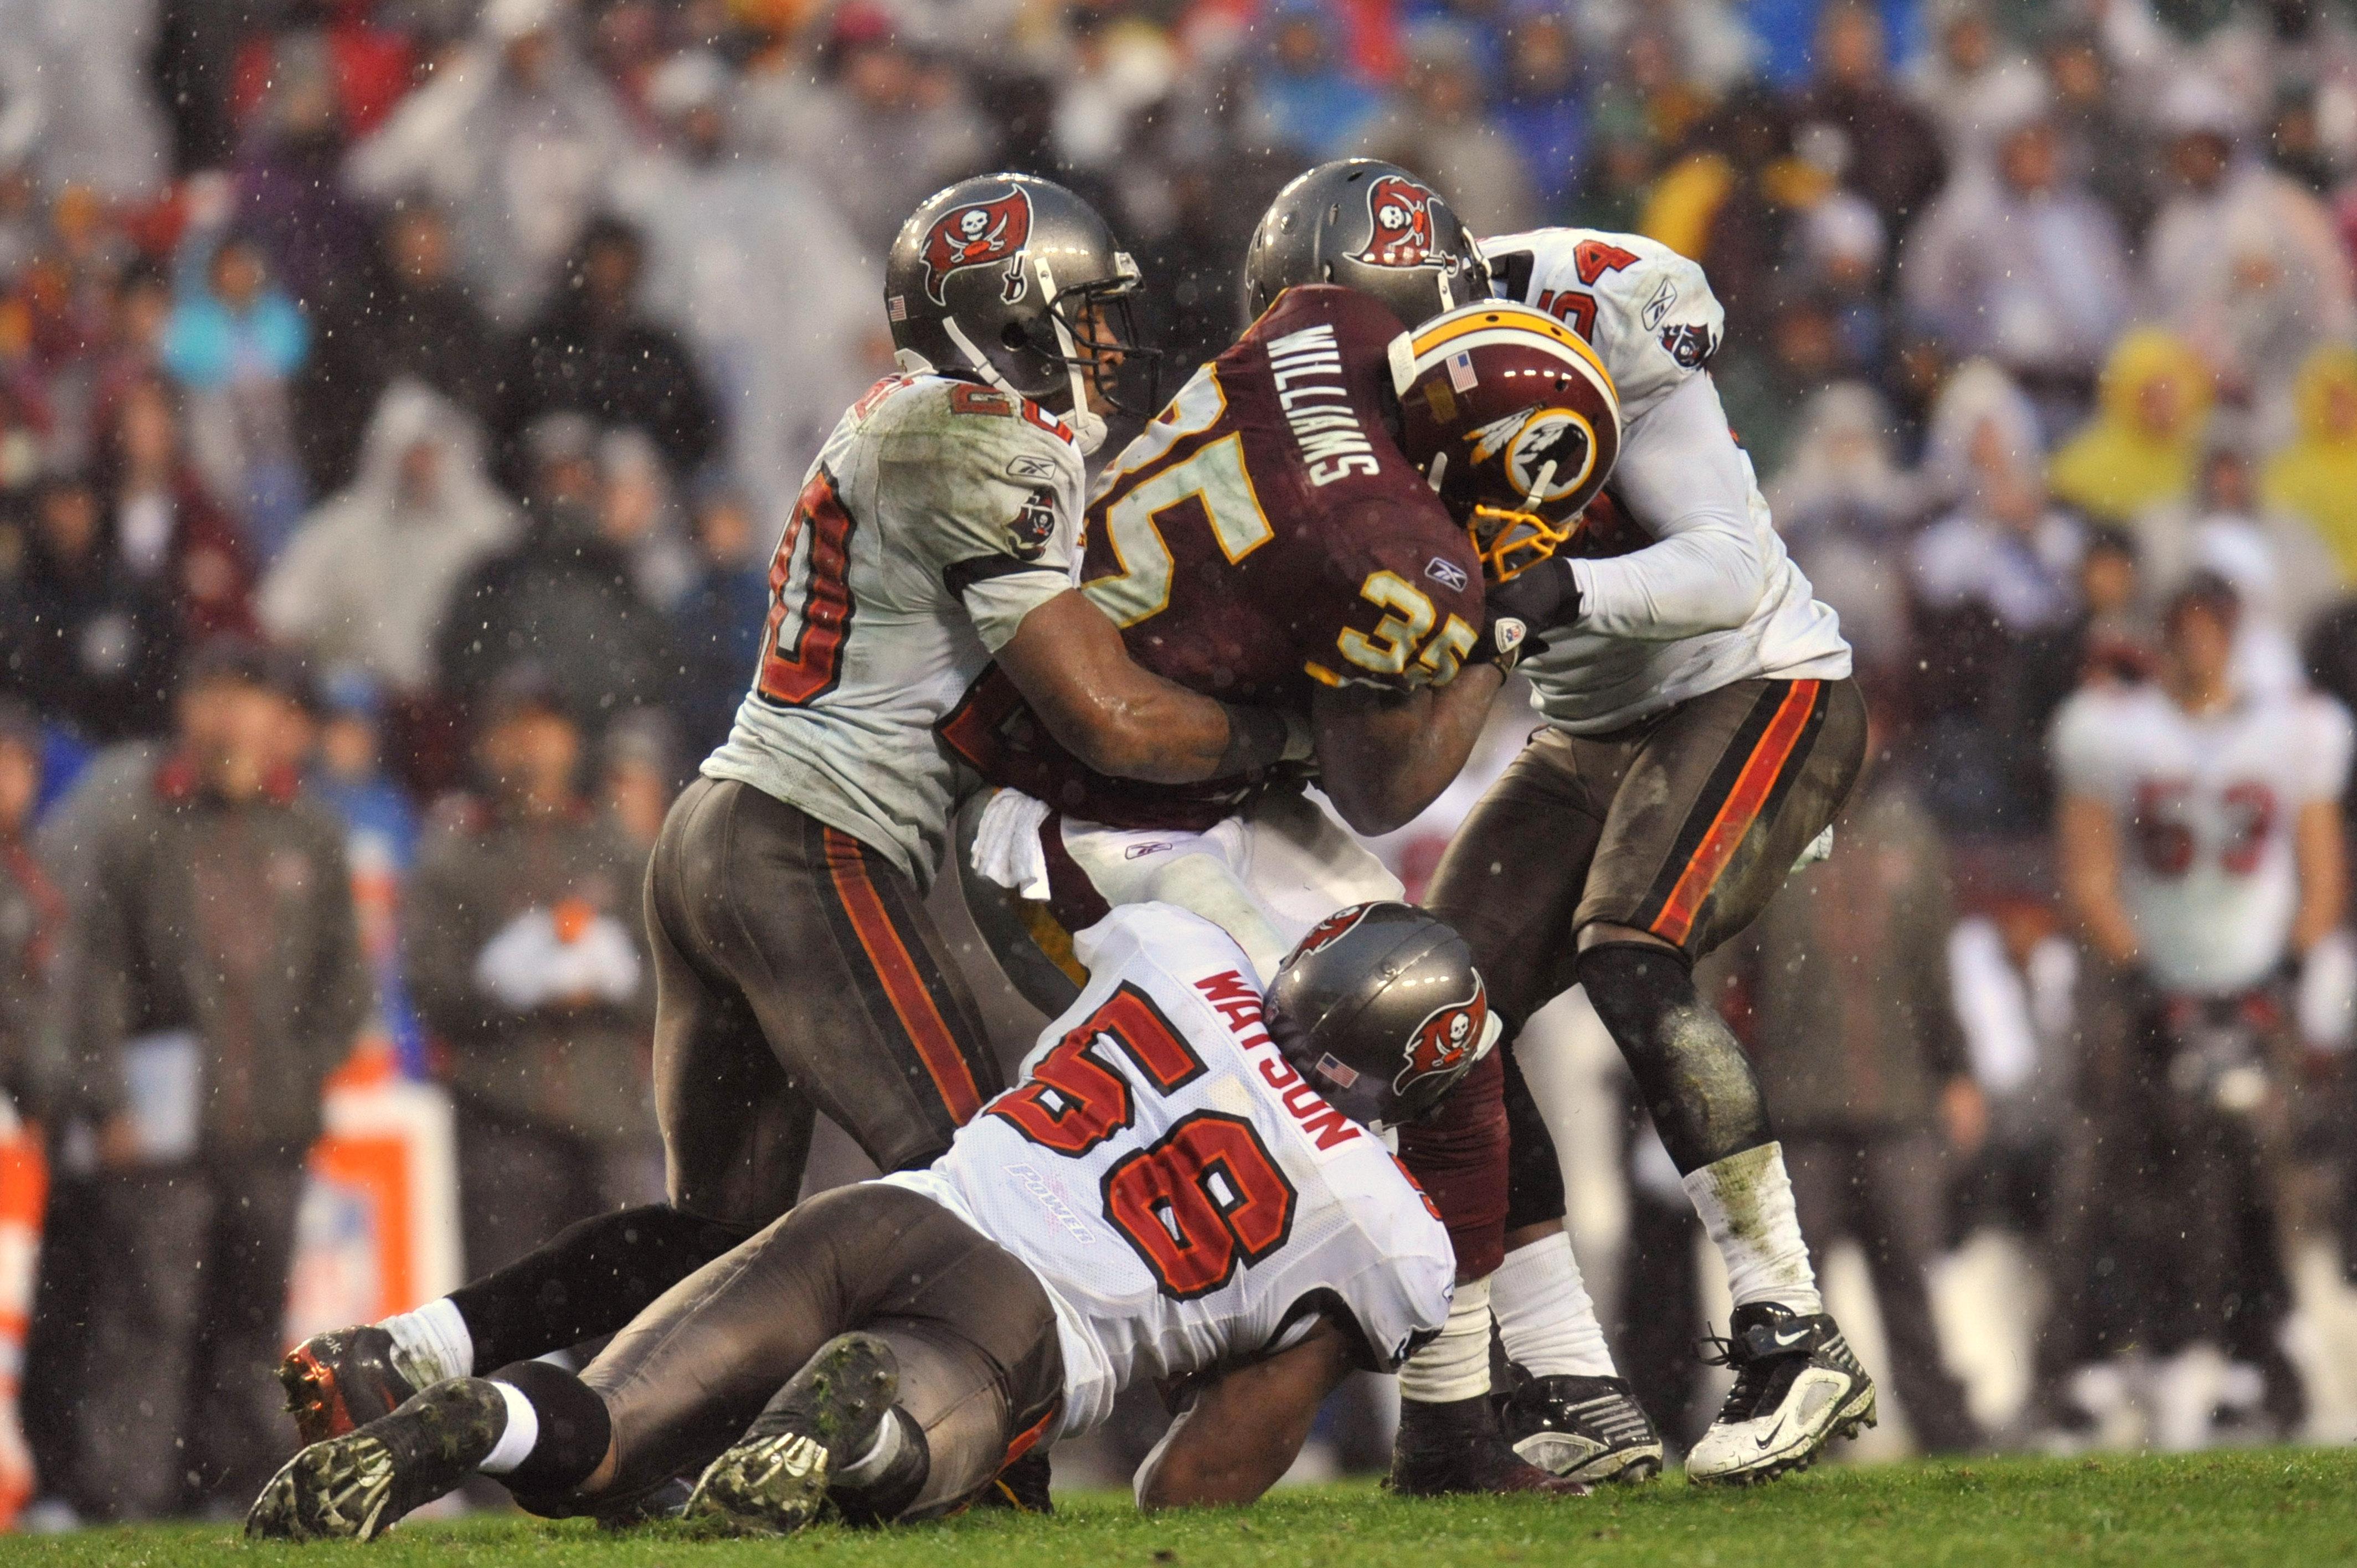 eb8f04349c1 LANDOVER, MD - DECEMBER 12: Keiland Williams #35 of the Washington Redskins  is